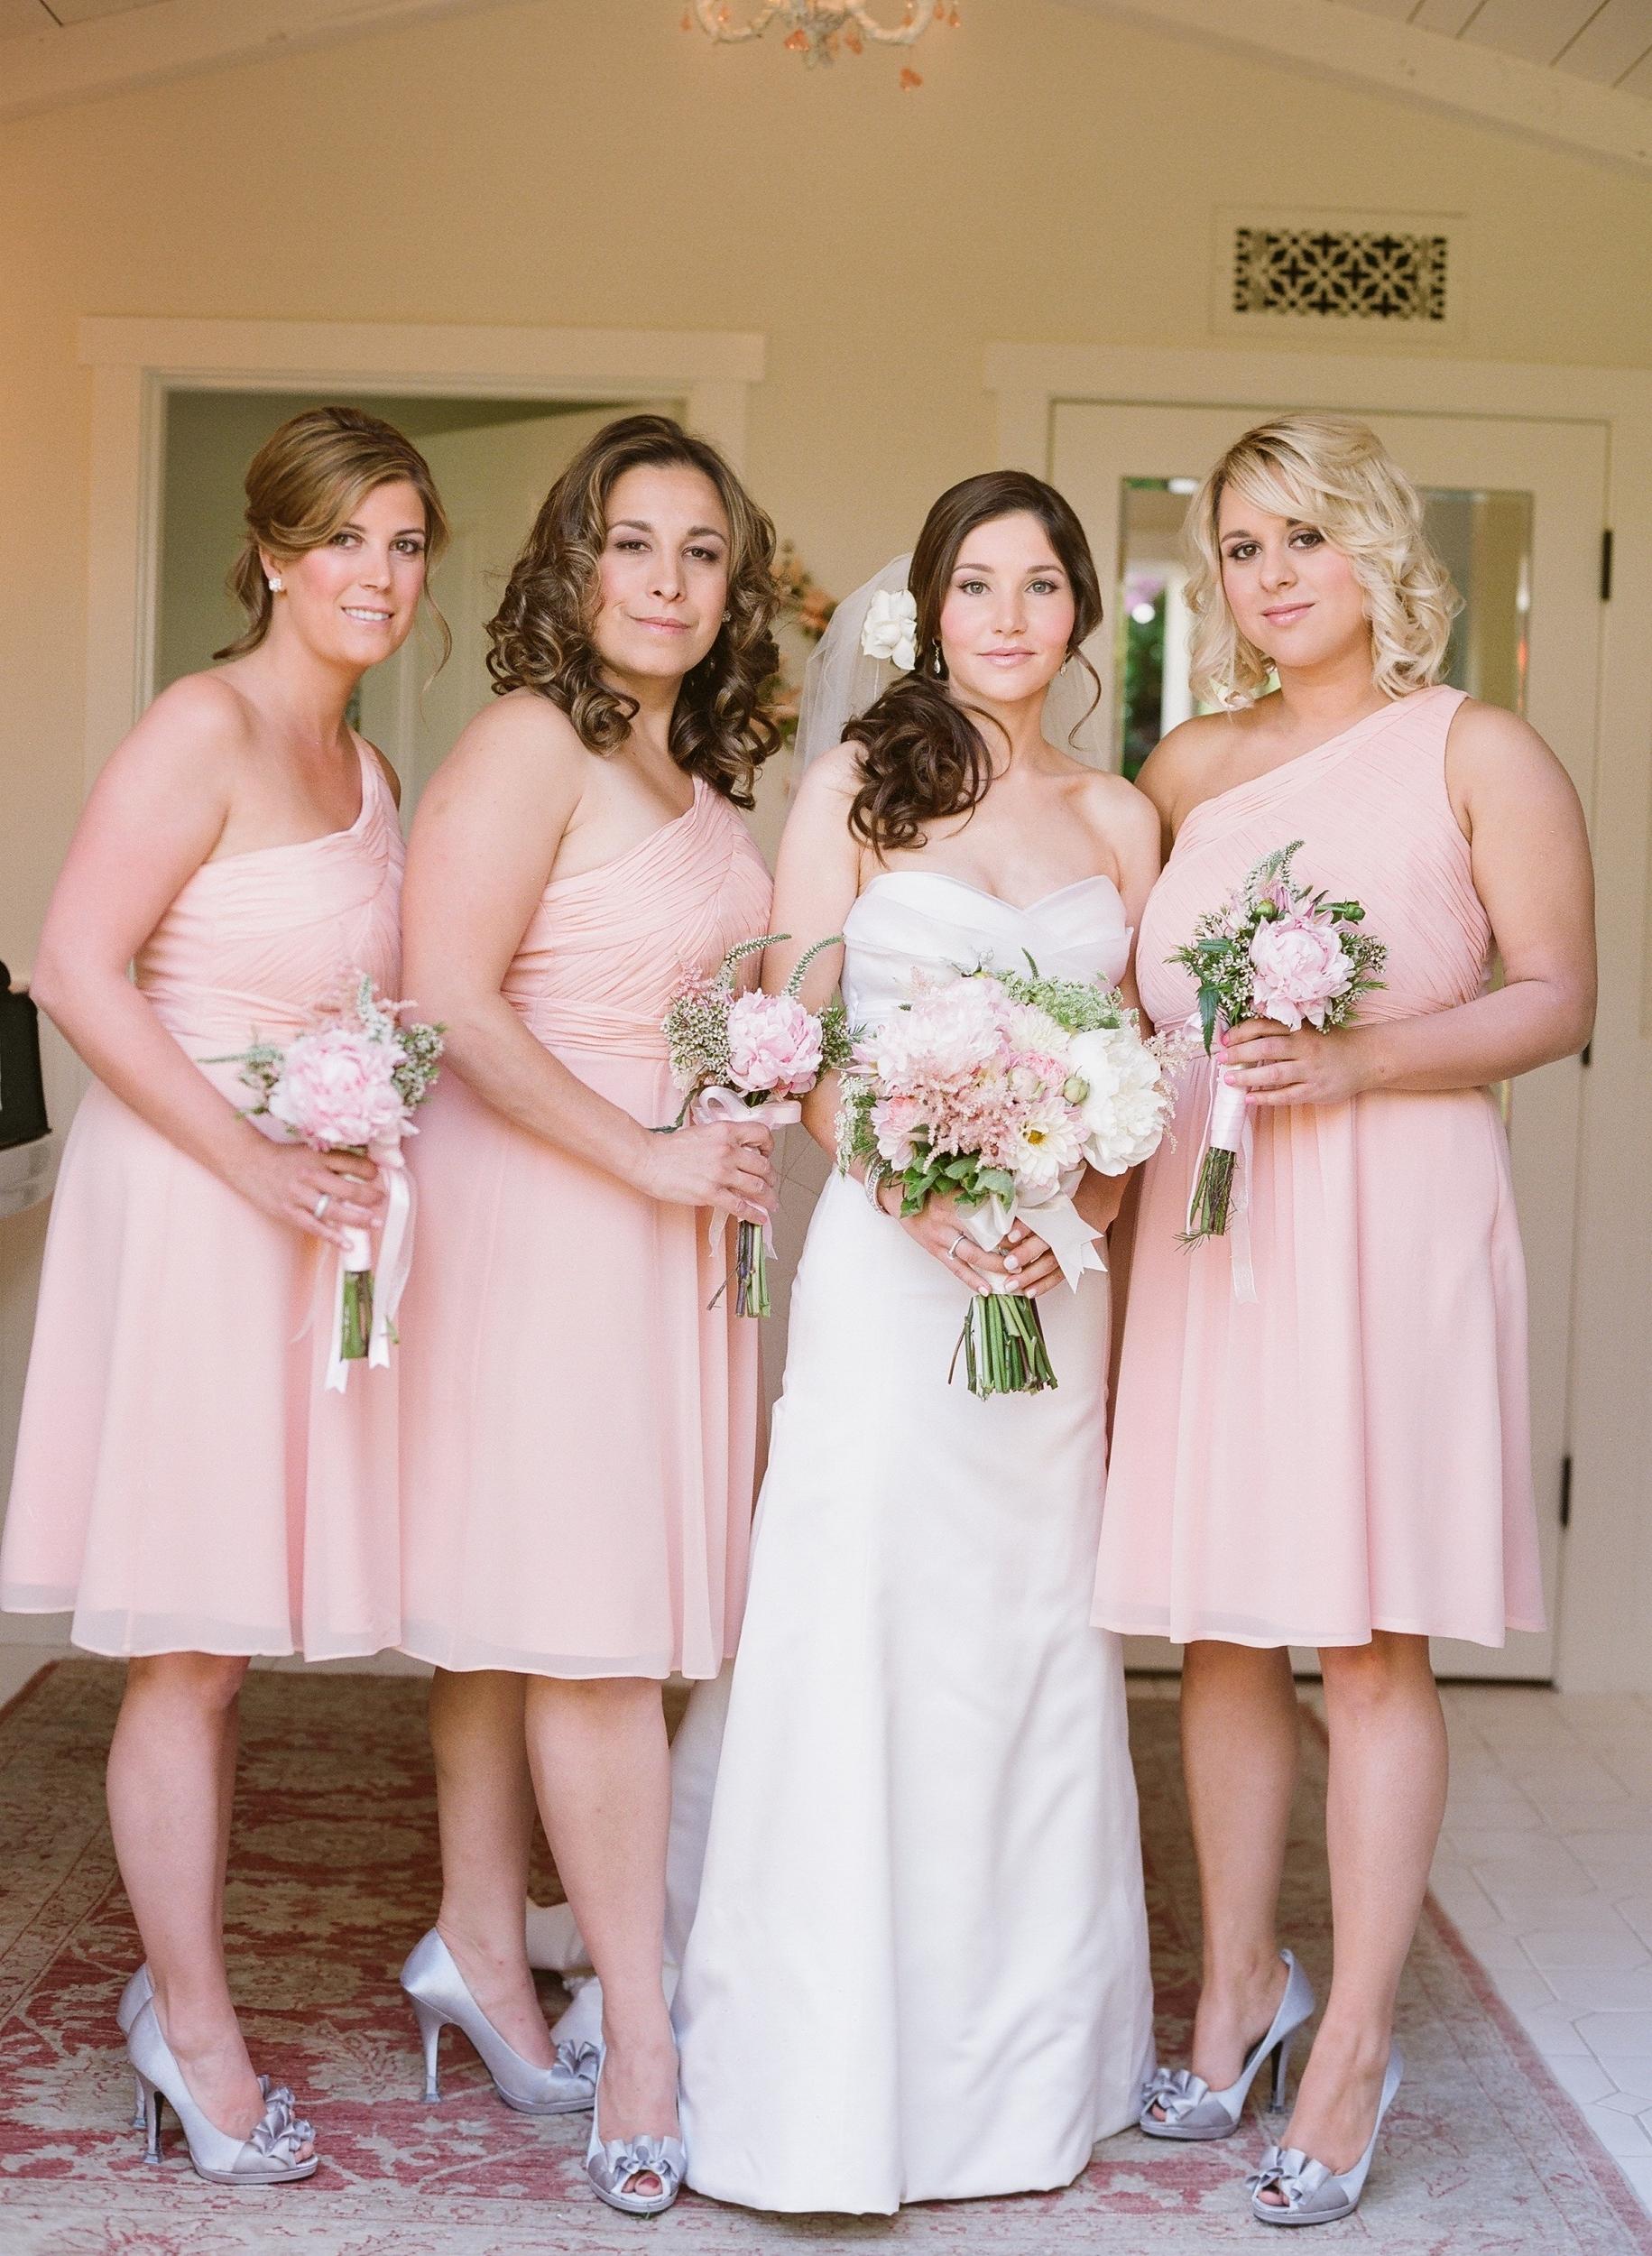 magnoliaeventdesign.com | A San Ysidro Ranch Wedding Photographed by Megan Sorel | Santa Barbara Wedding Planner and Designer | Magnolia Event Design